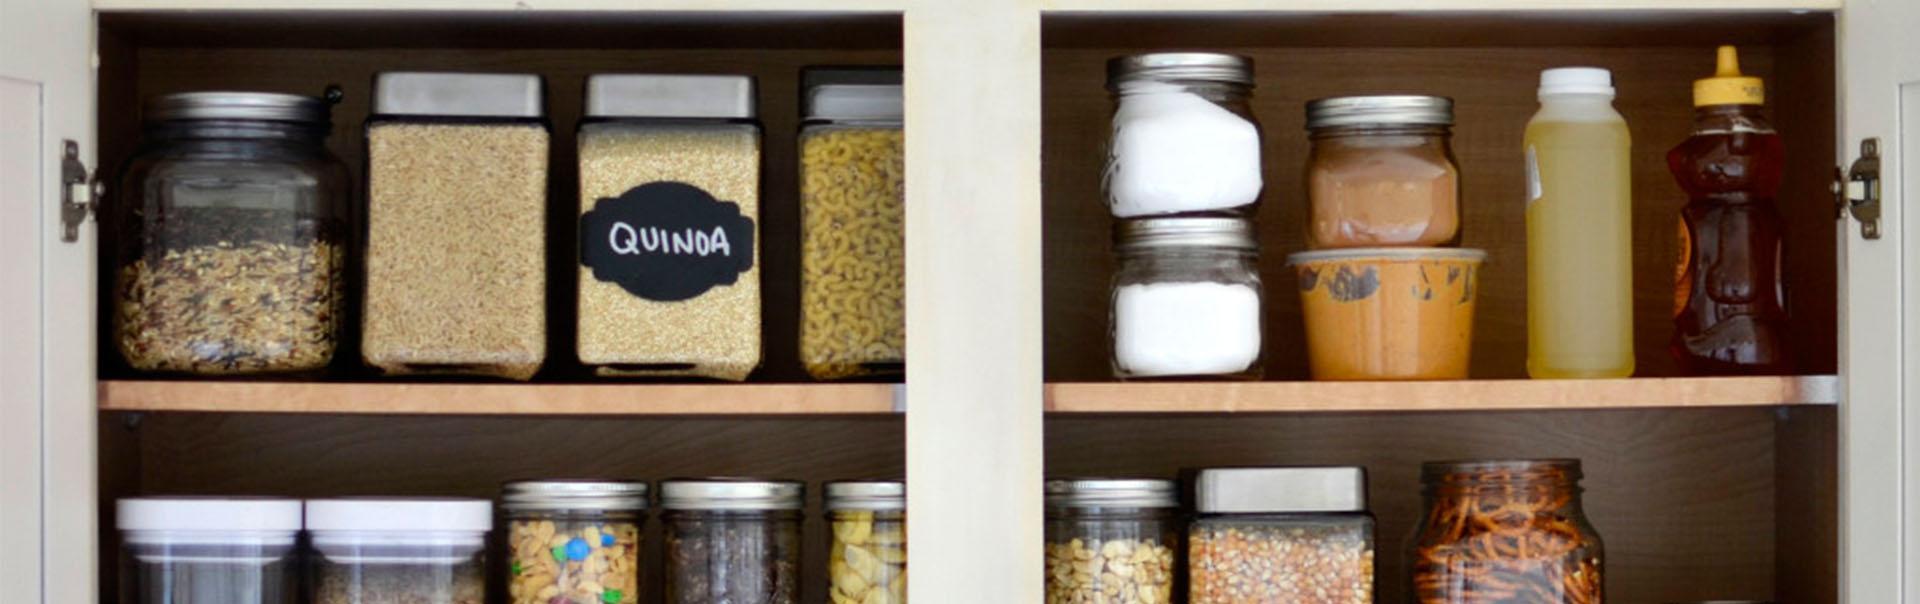 Cupboard Ingredients Powdered